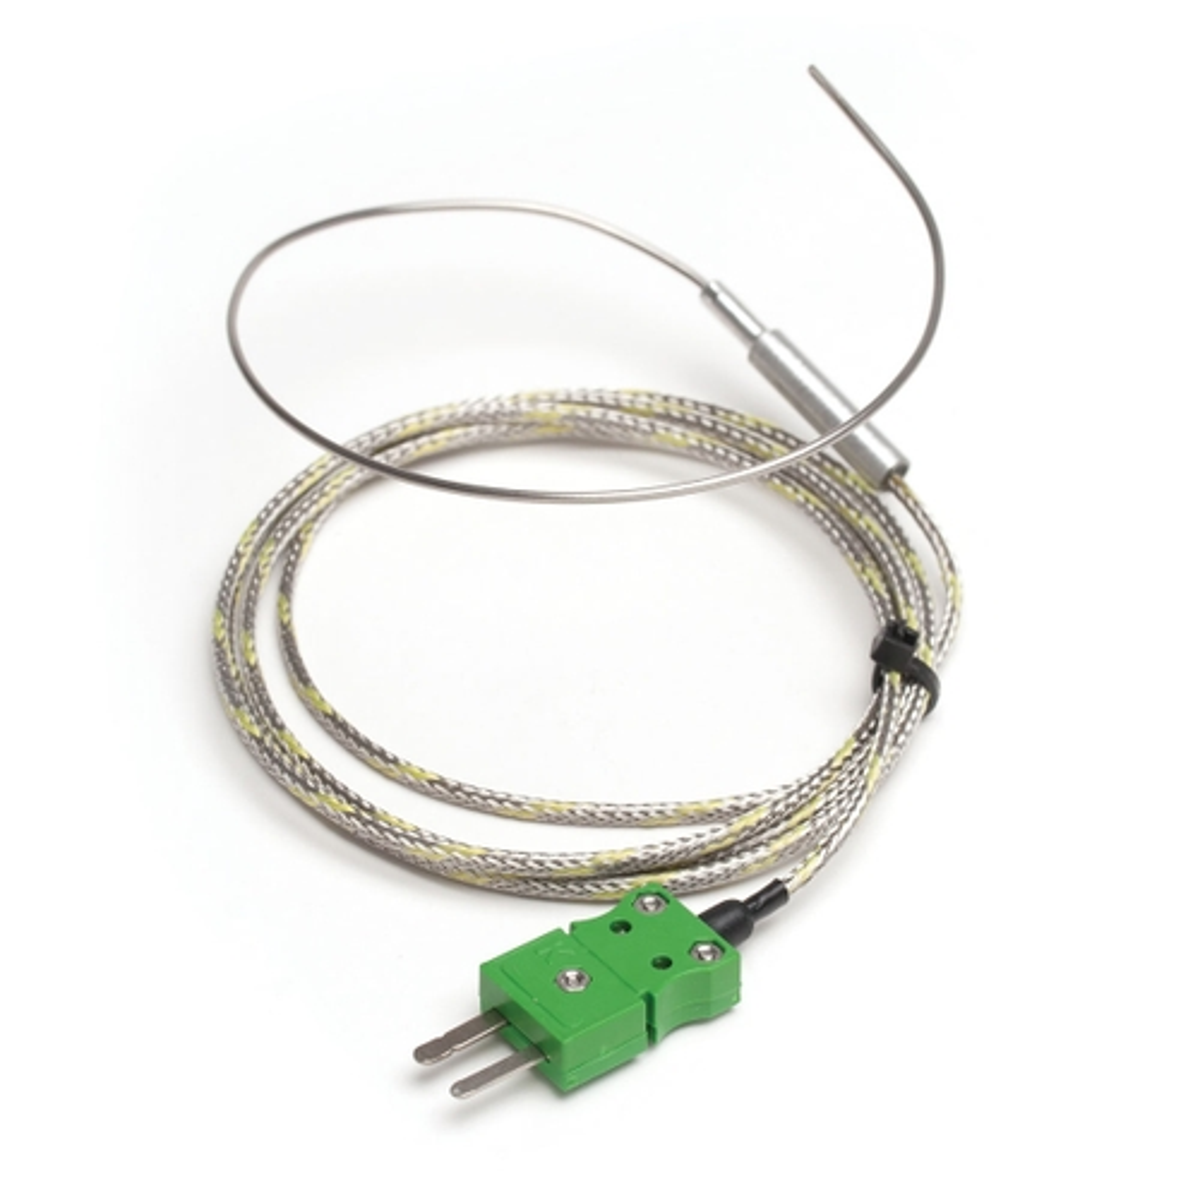 HI766F Flexible High Temperature K-Type Thermocouple Probe